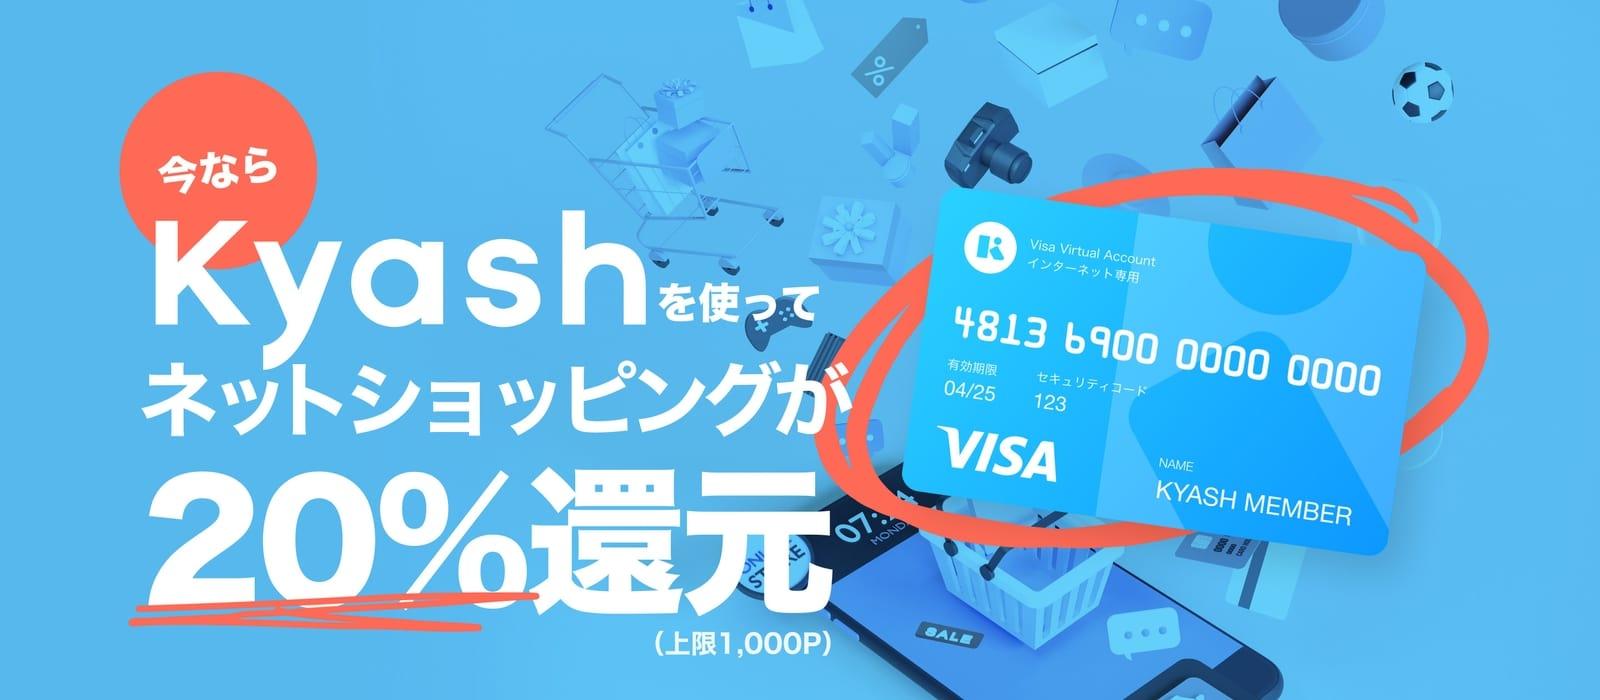 Kyashでネットショッピングが初めて限定20%還元。ただし上限1000ポイントバックまで。6/18~。